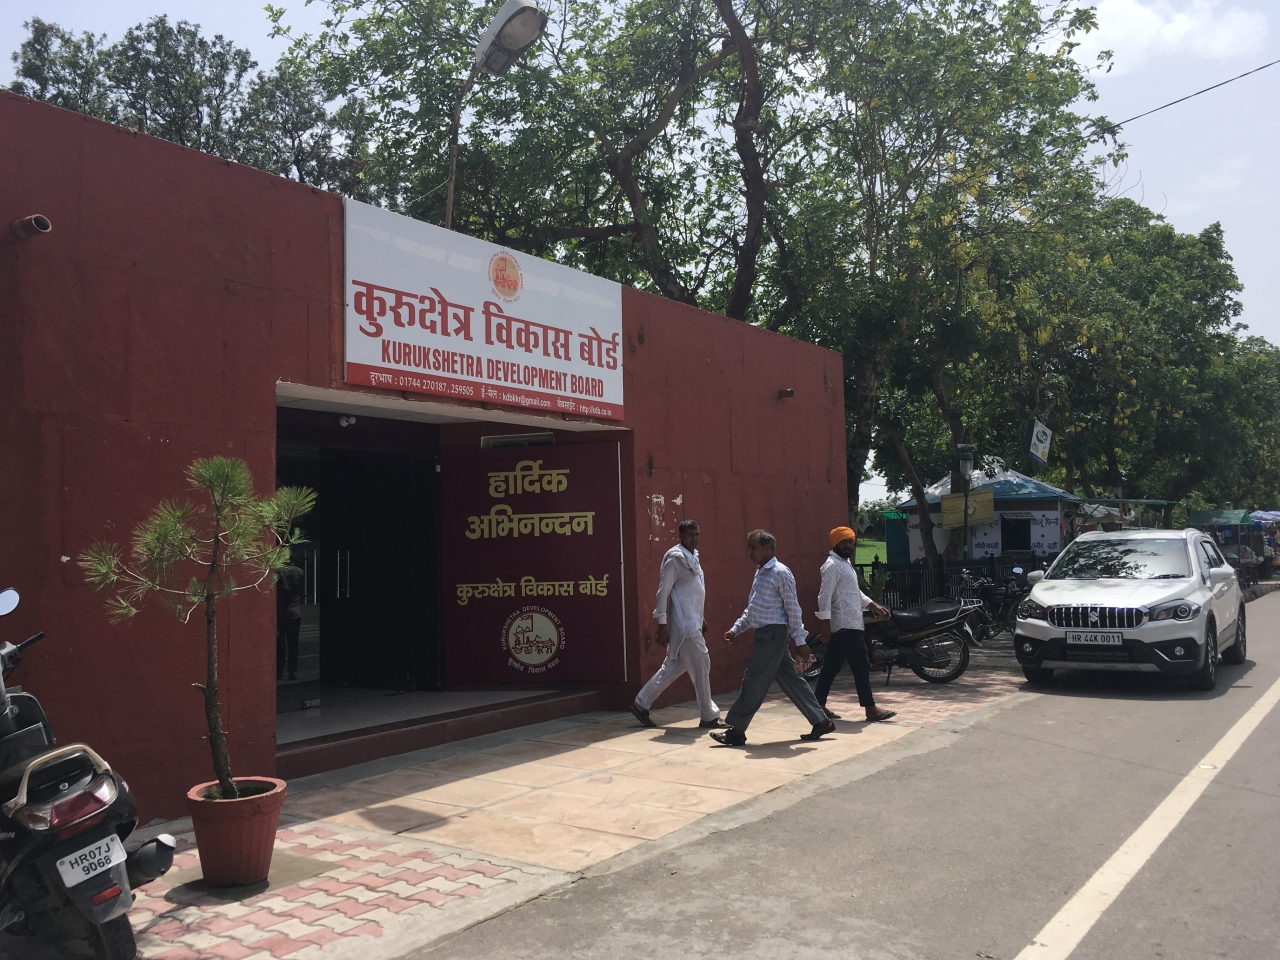 The office of Kurukshetra Development Board.